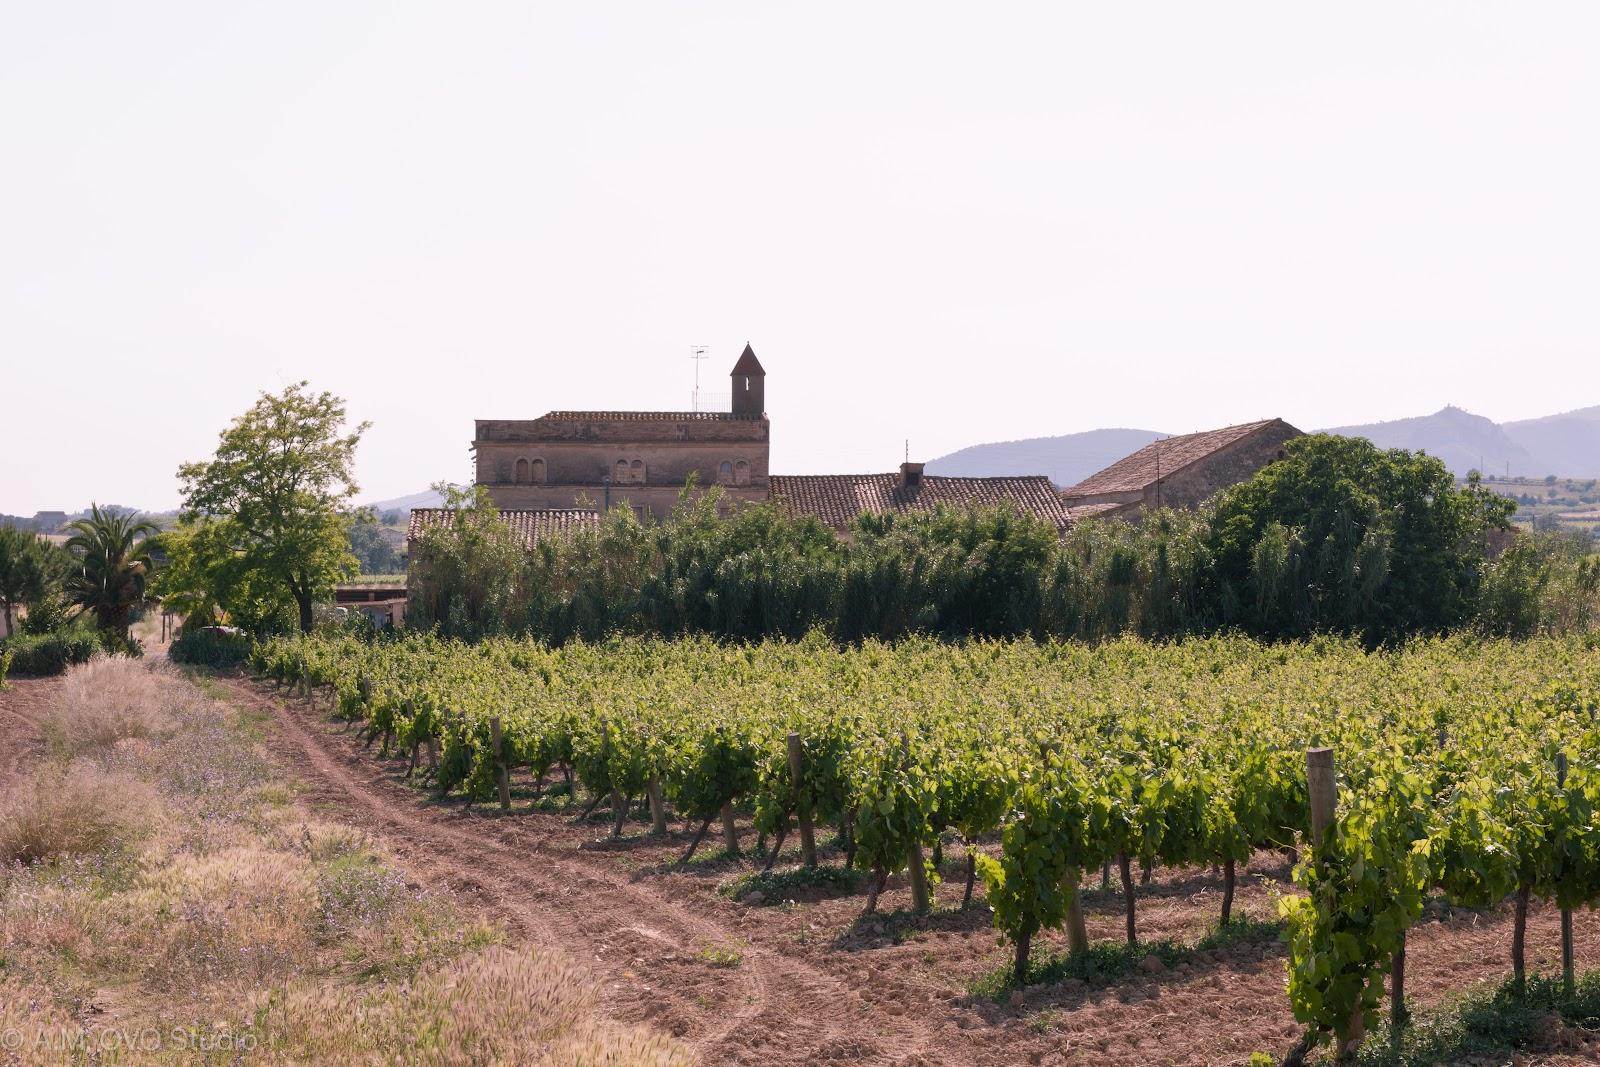 Vilafranca del Penedes Spain  city photos gallery : ... at 01 15 tags barcelona country houses penedès rural spain spain